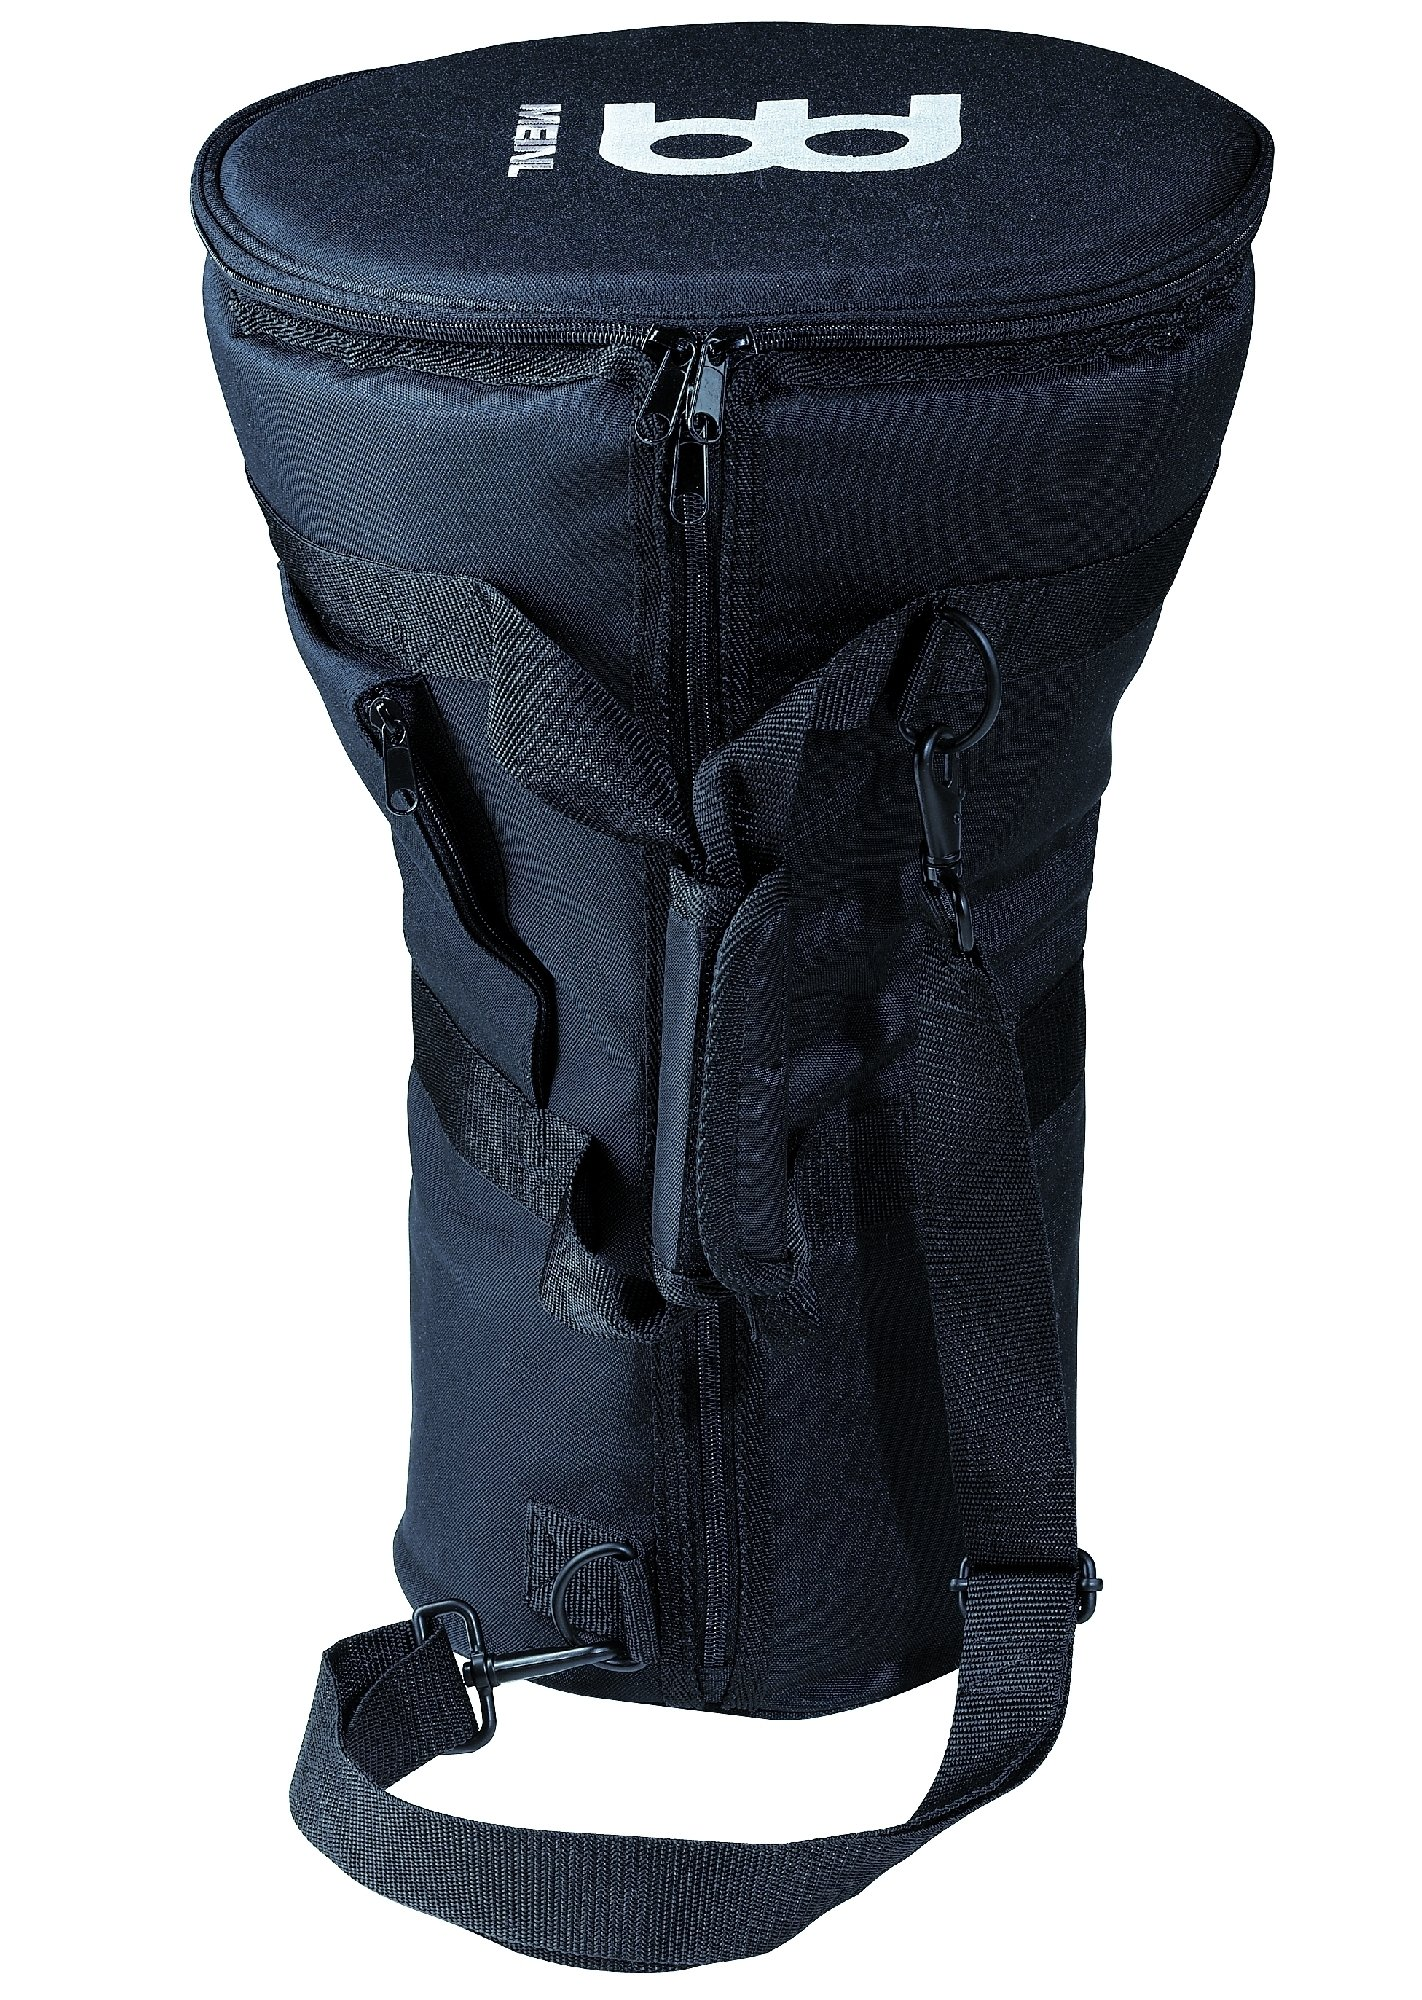 Meinl Percussion MDOB Professional Doumbek Bag, Black